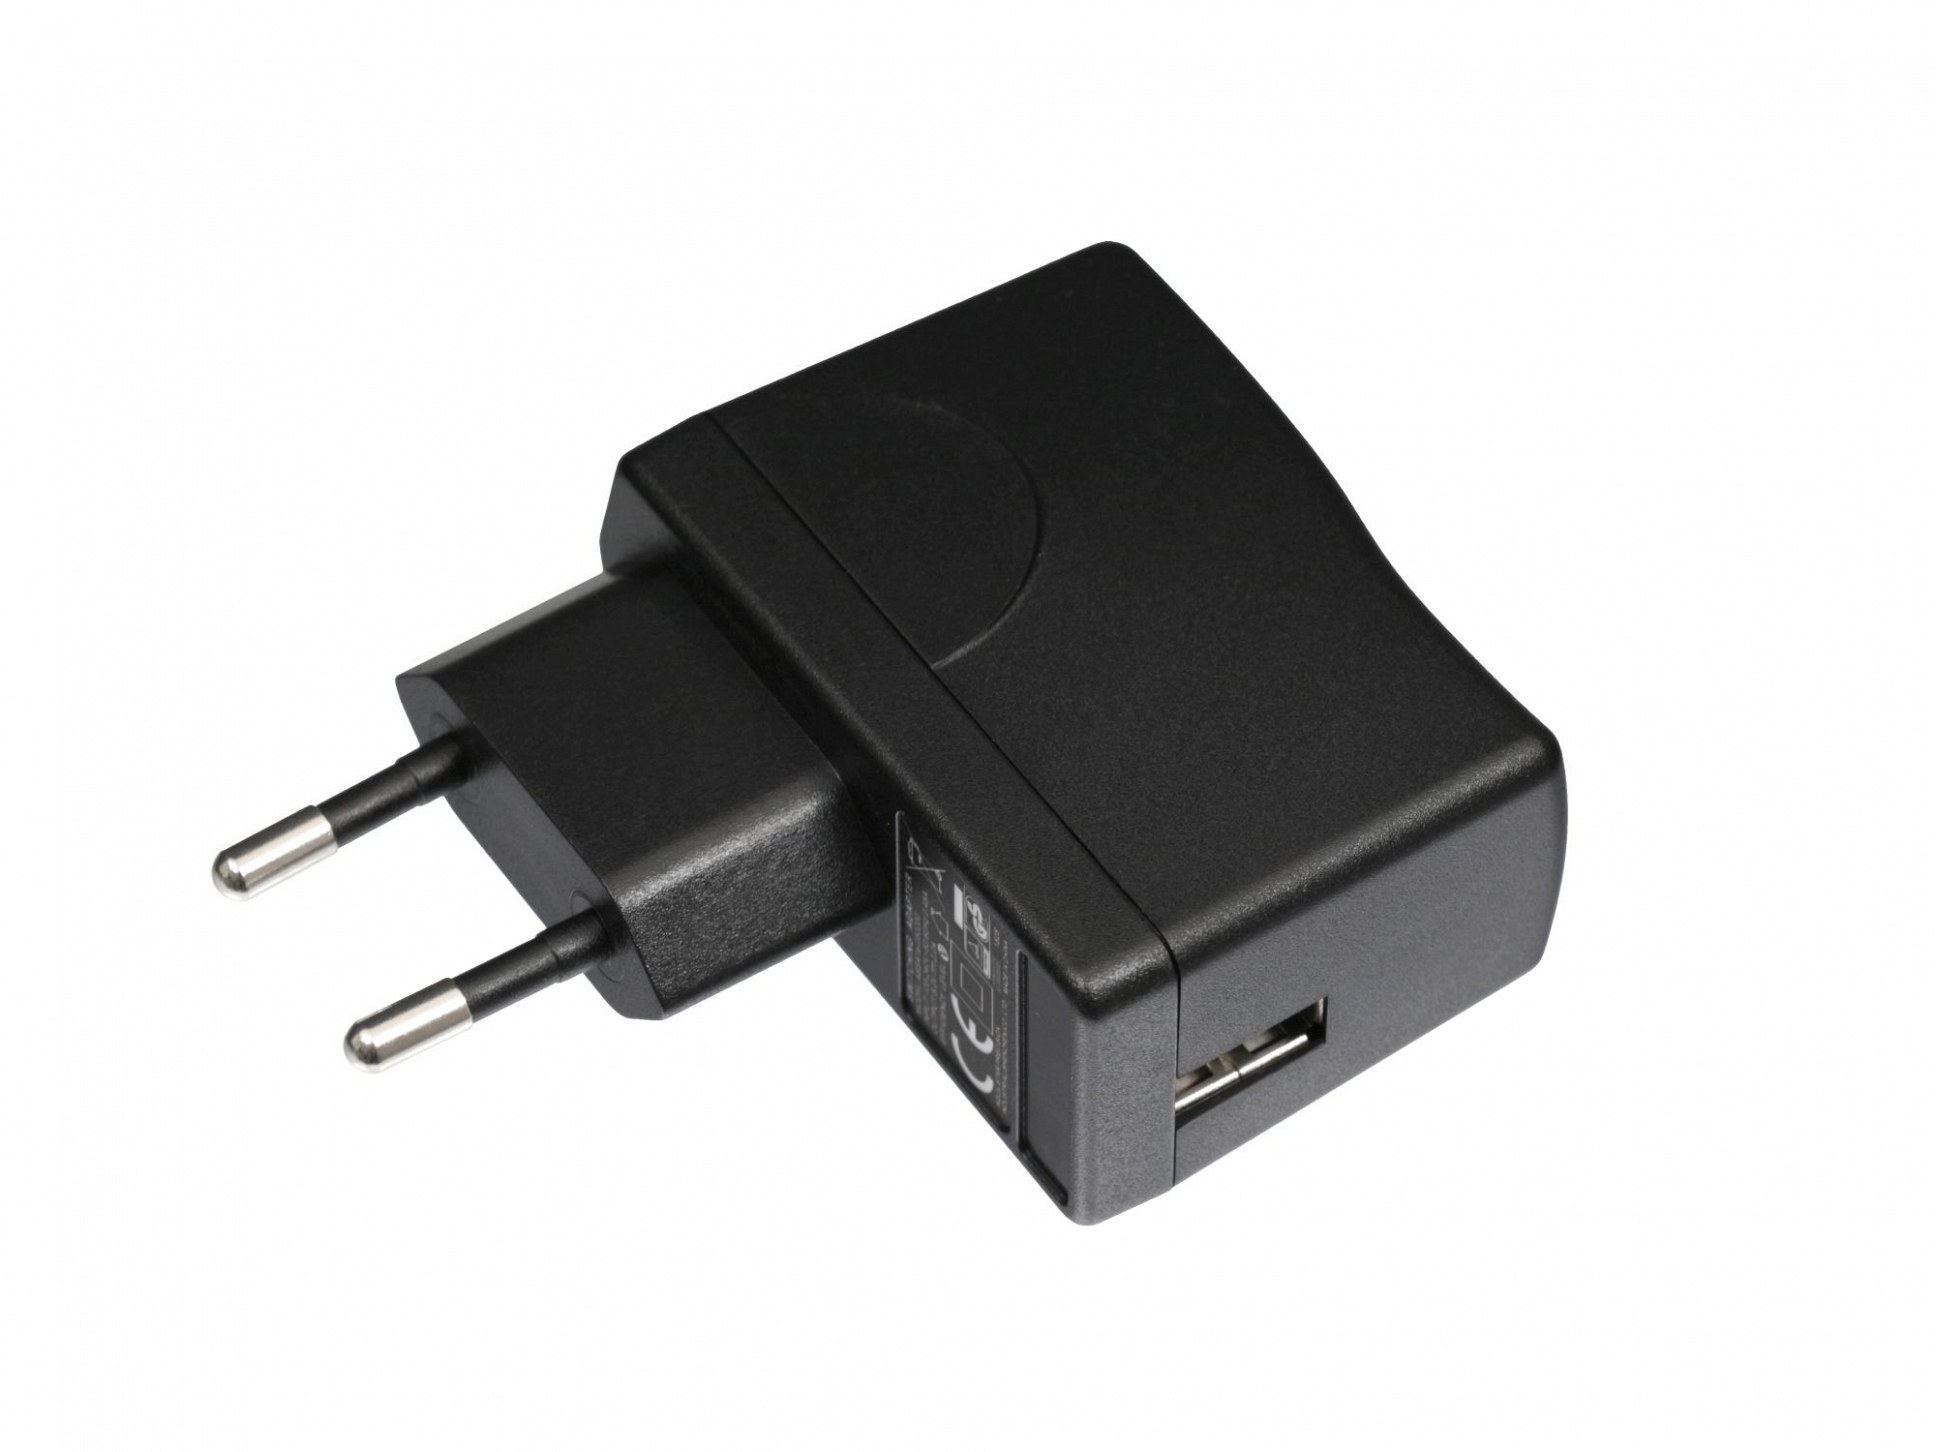 USB Netzteil 10 Watt EU Wallplug für Medion Lifetab P10400 Serie